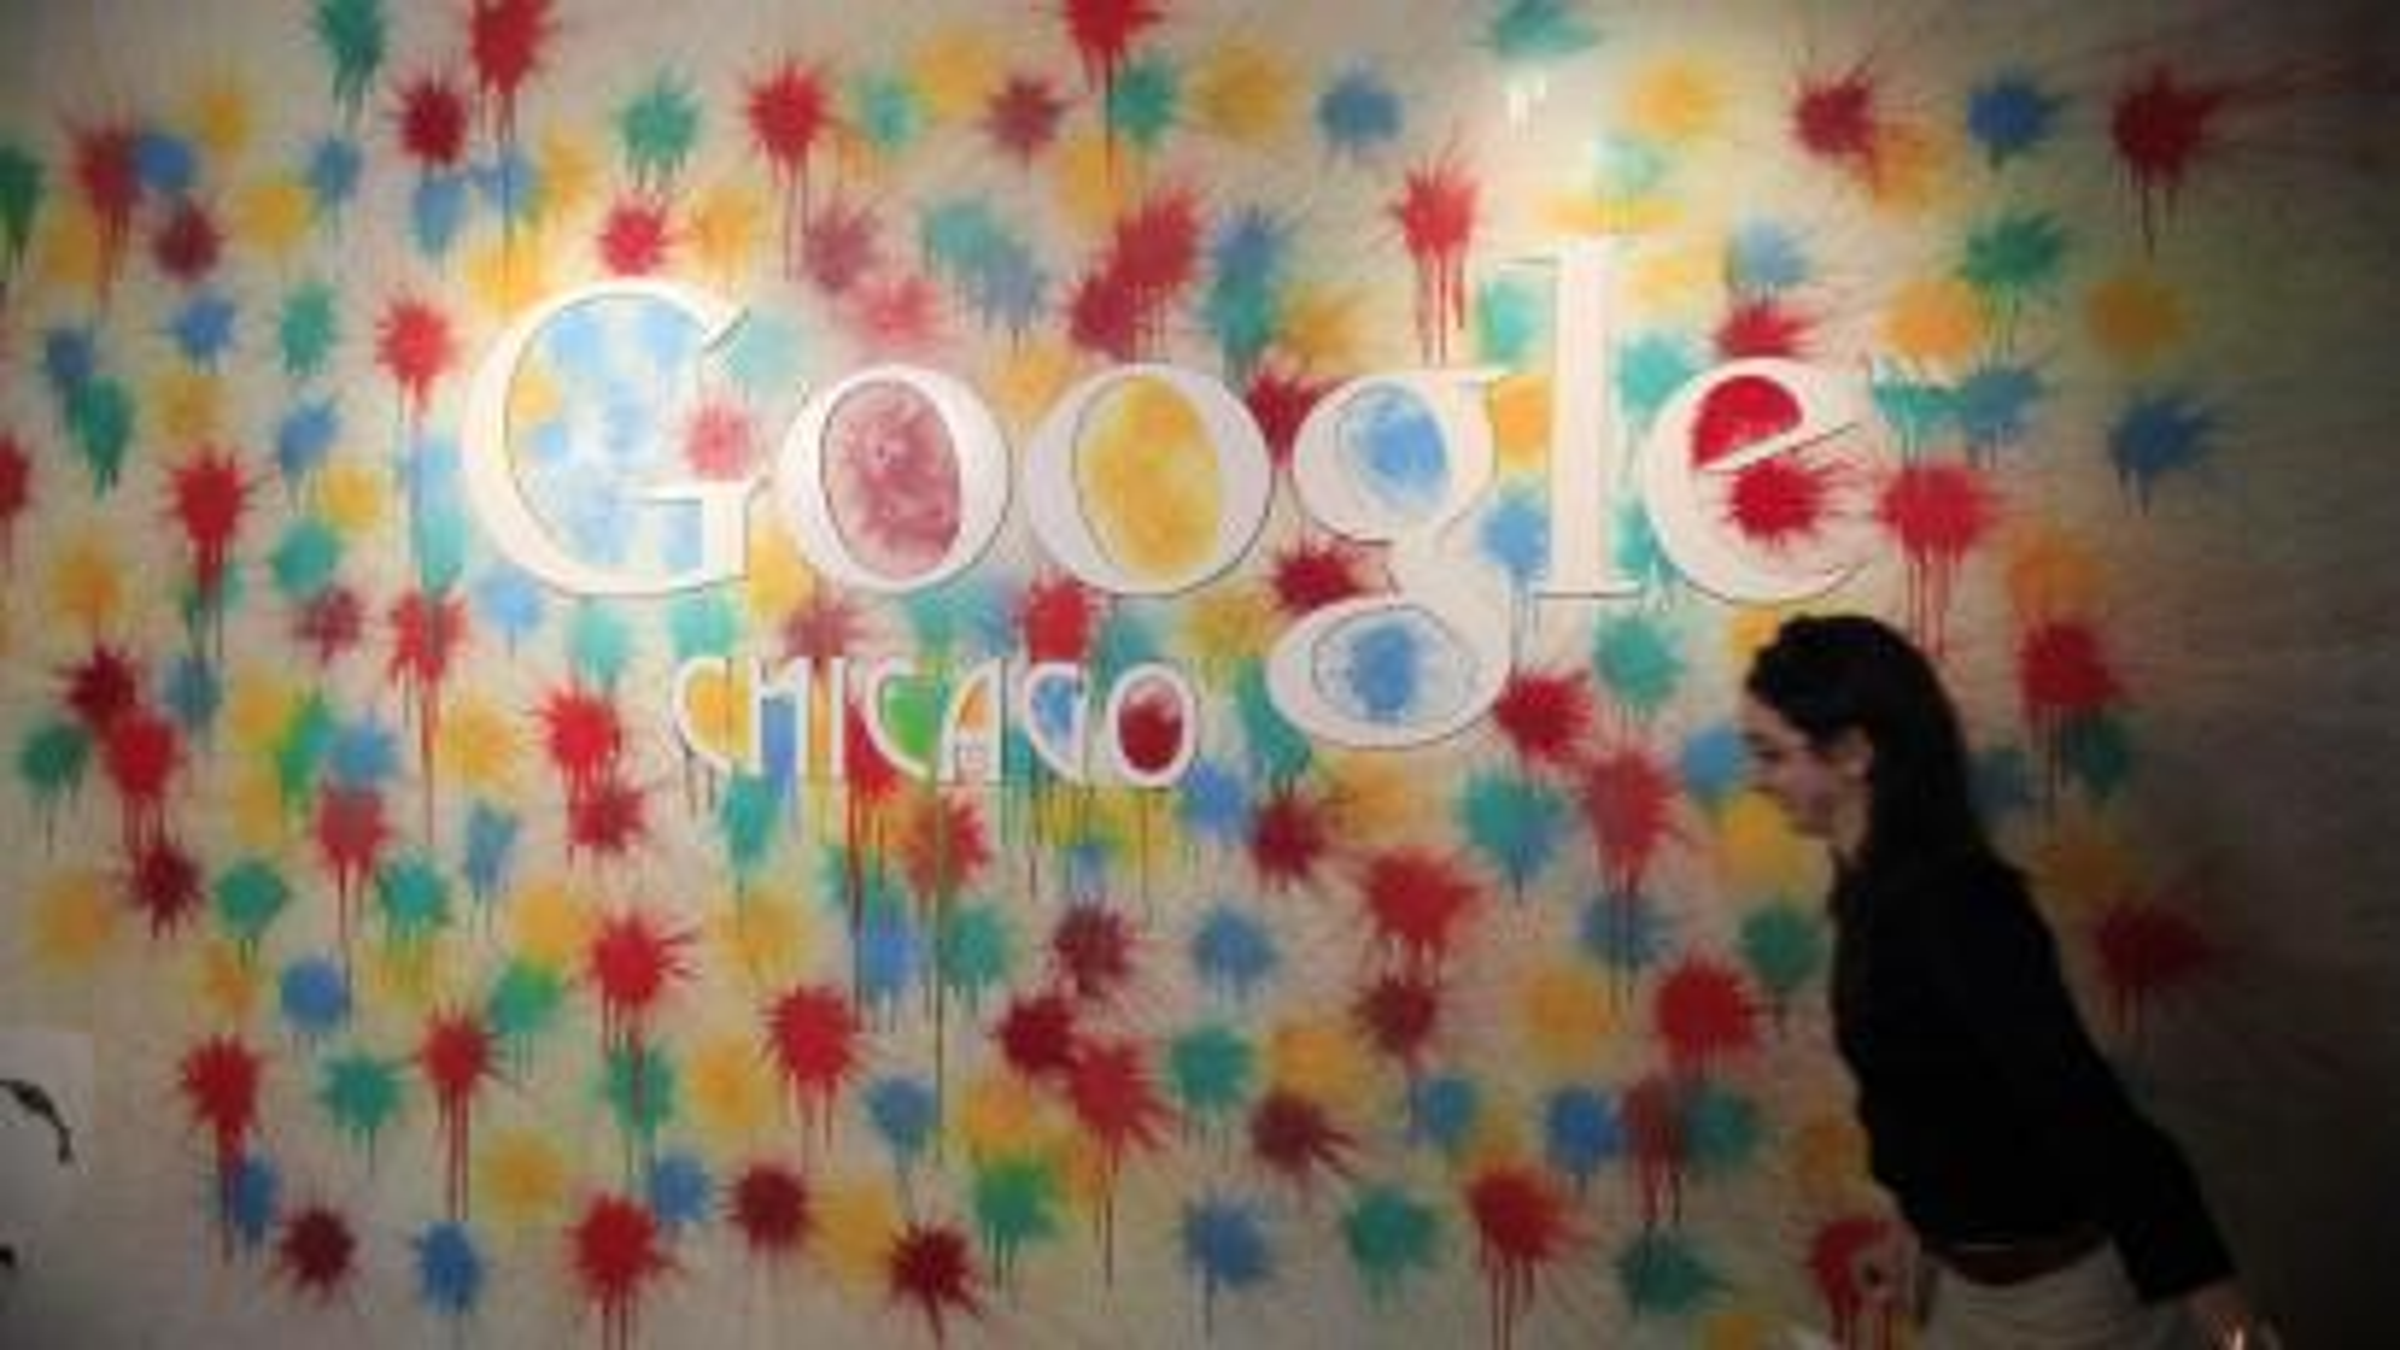 Entrance of Google Chicago